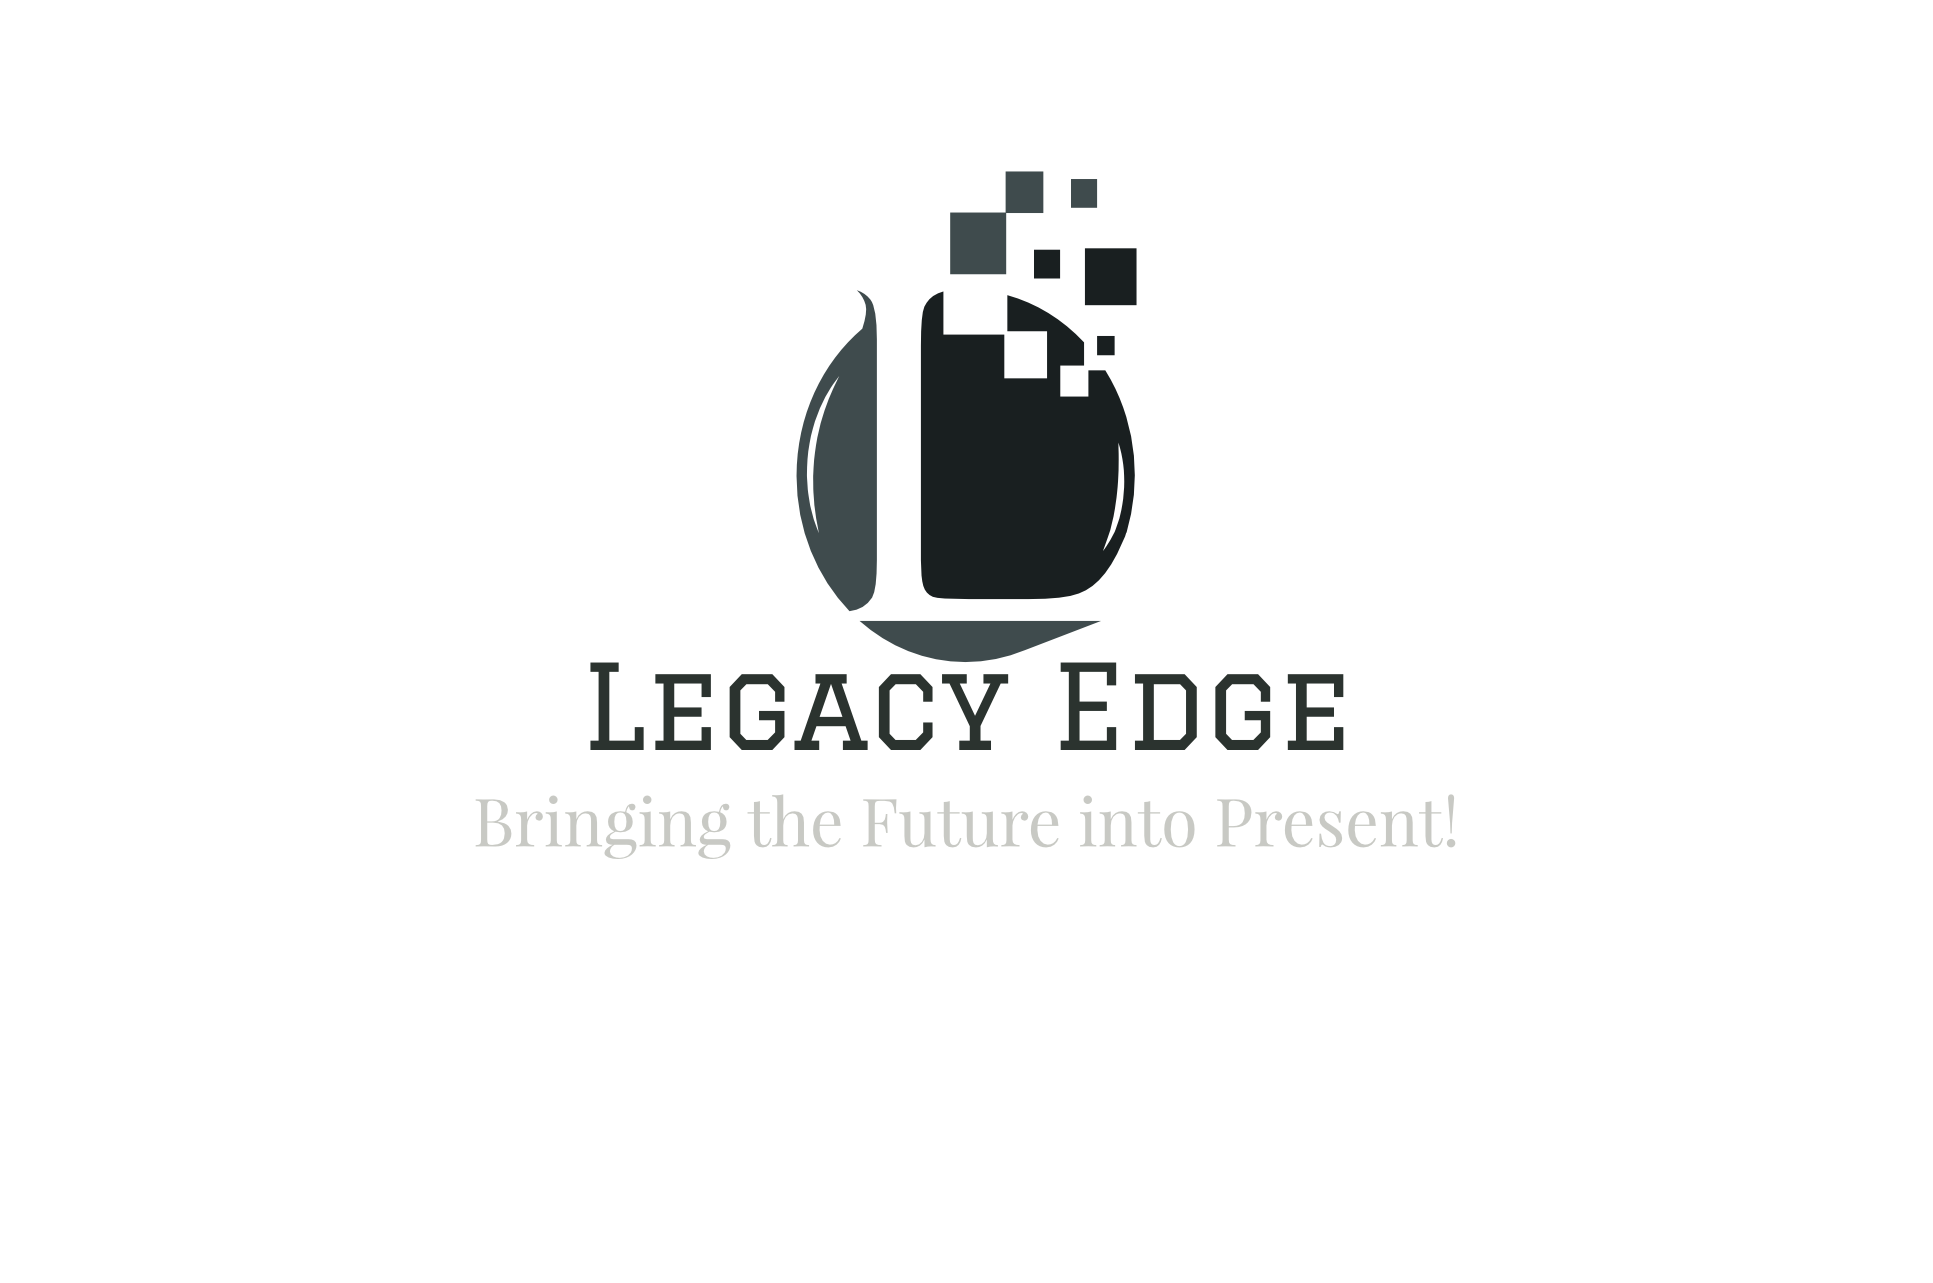 Legacy Edge